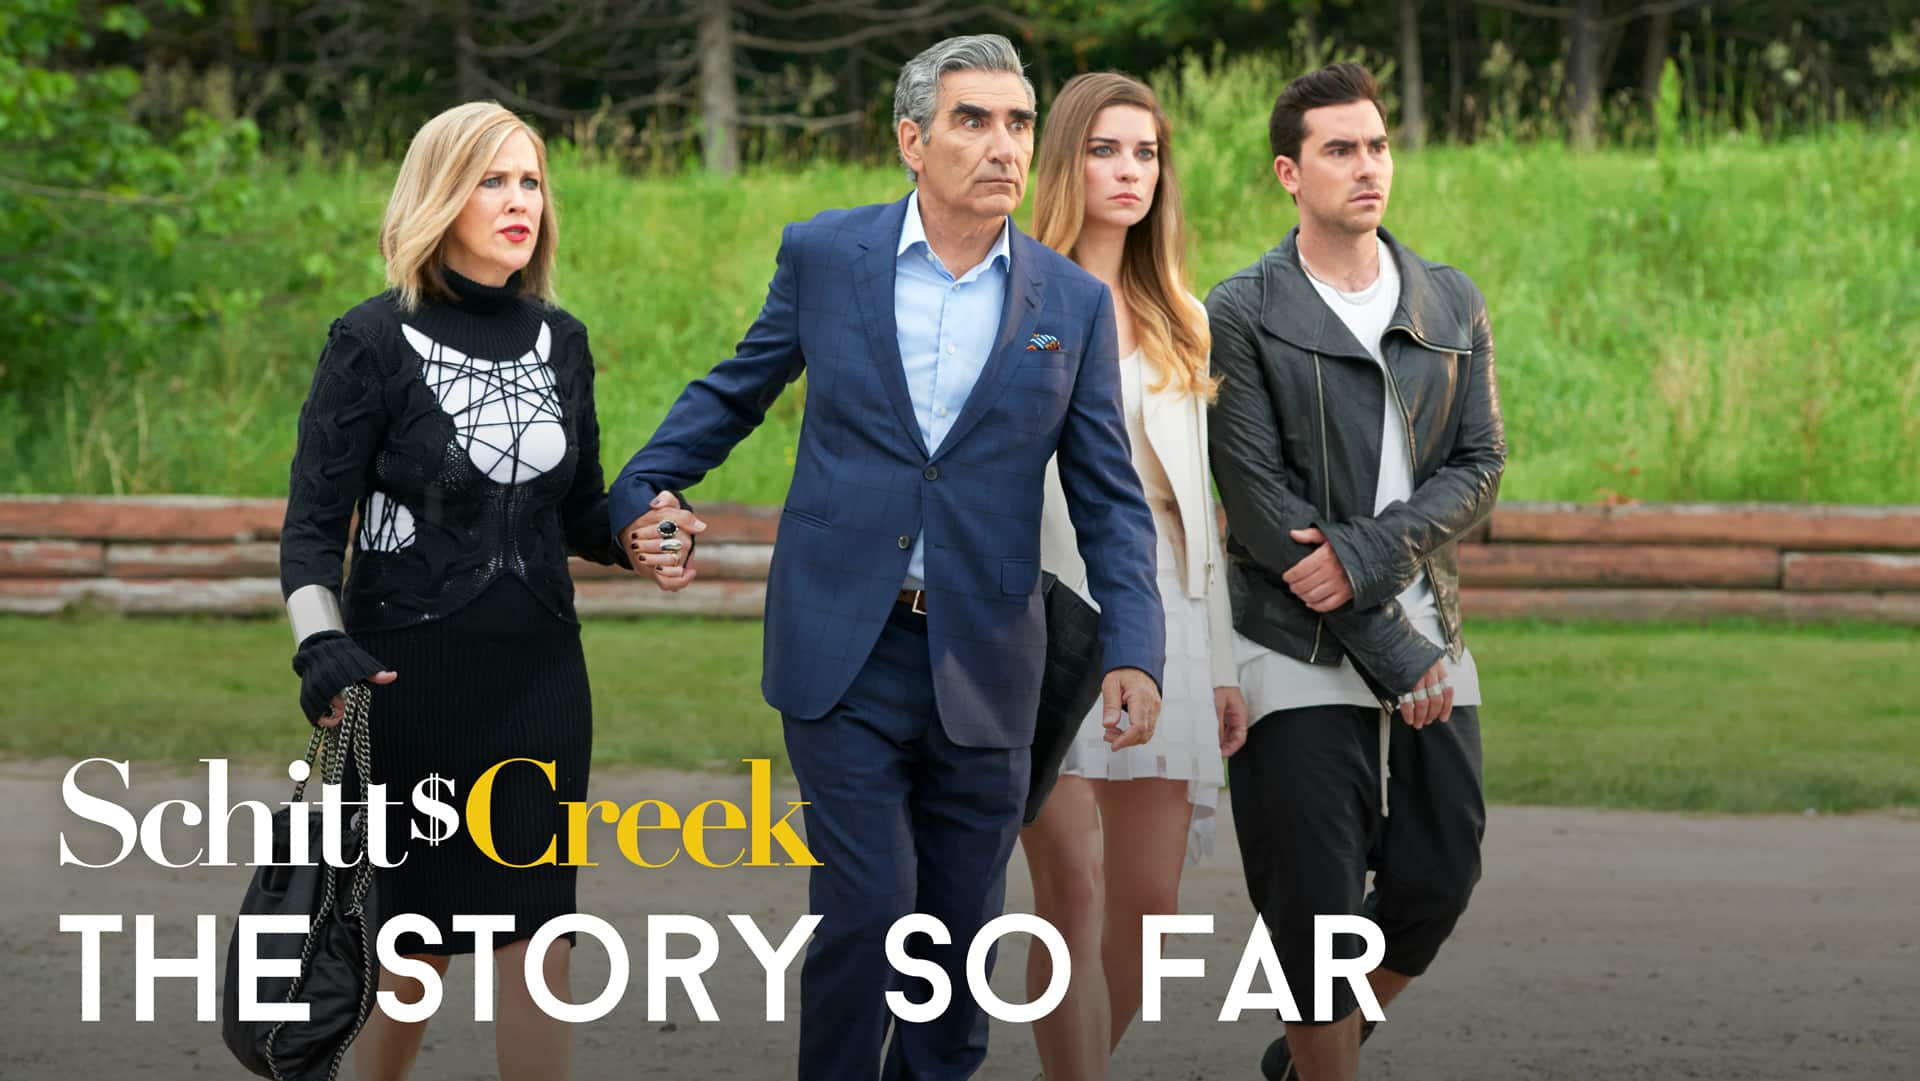 sc_story-so-far